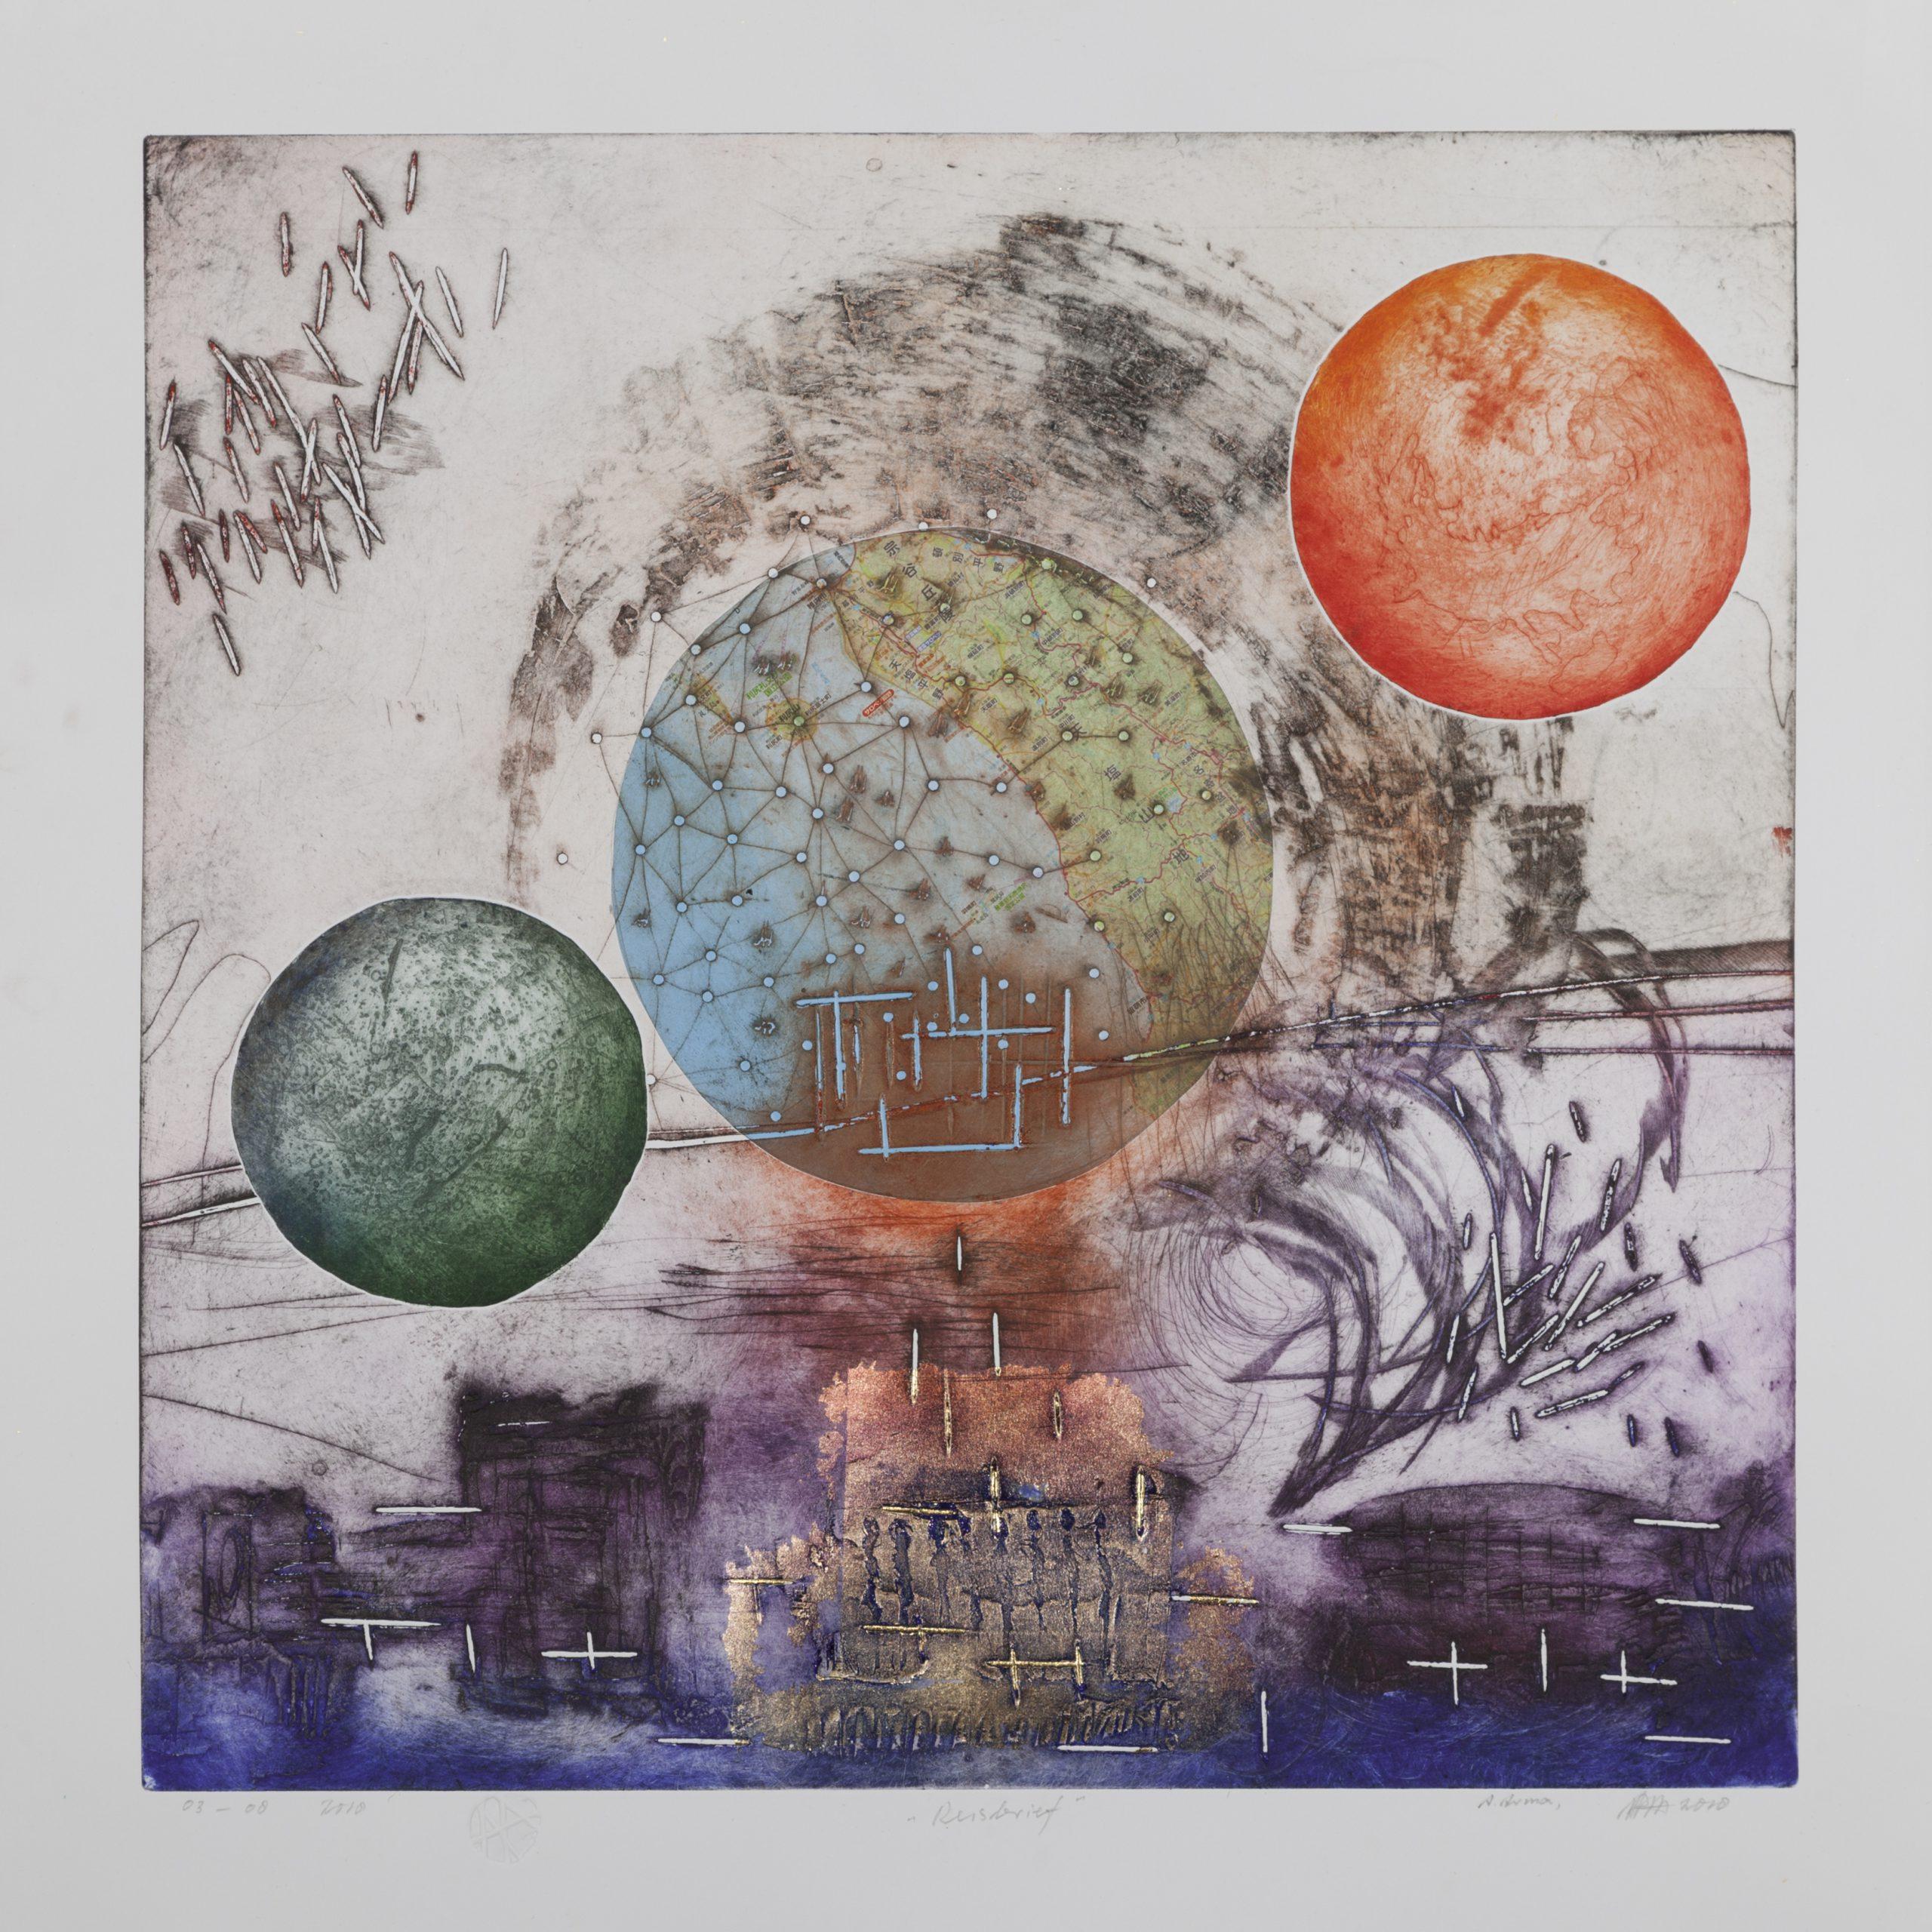 Kunst: Reisbrief van kunstenaar Ad Arma